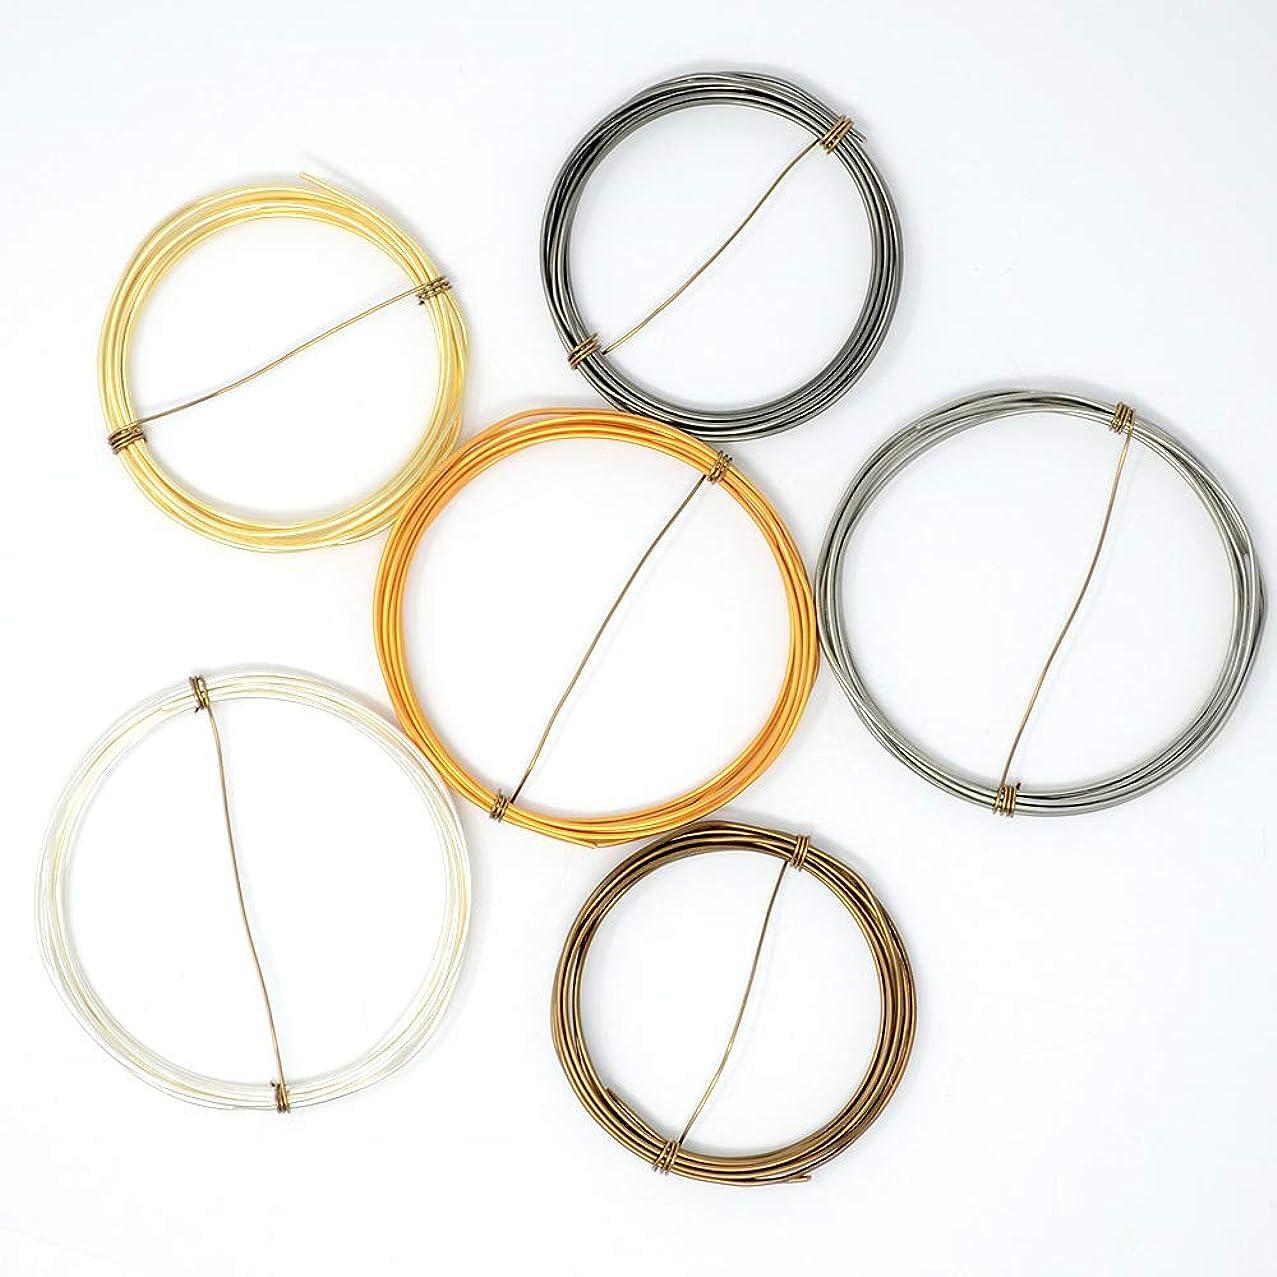 Metal Mix w/Silver - Enameled Copper Wire Spools – 18 Gauge - Bronze, Gold, Hematite, Silver, Titanium, Vintage Bronze - 5 feet of Each Color (30 Total feet)